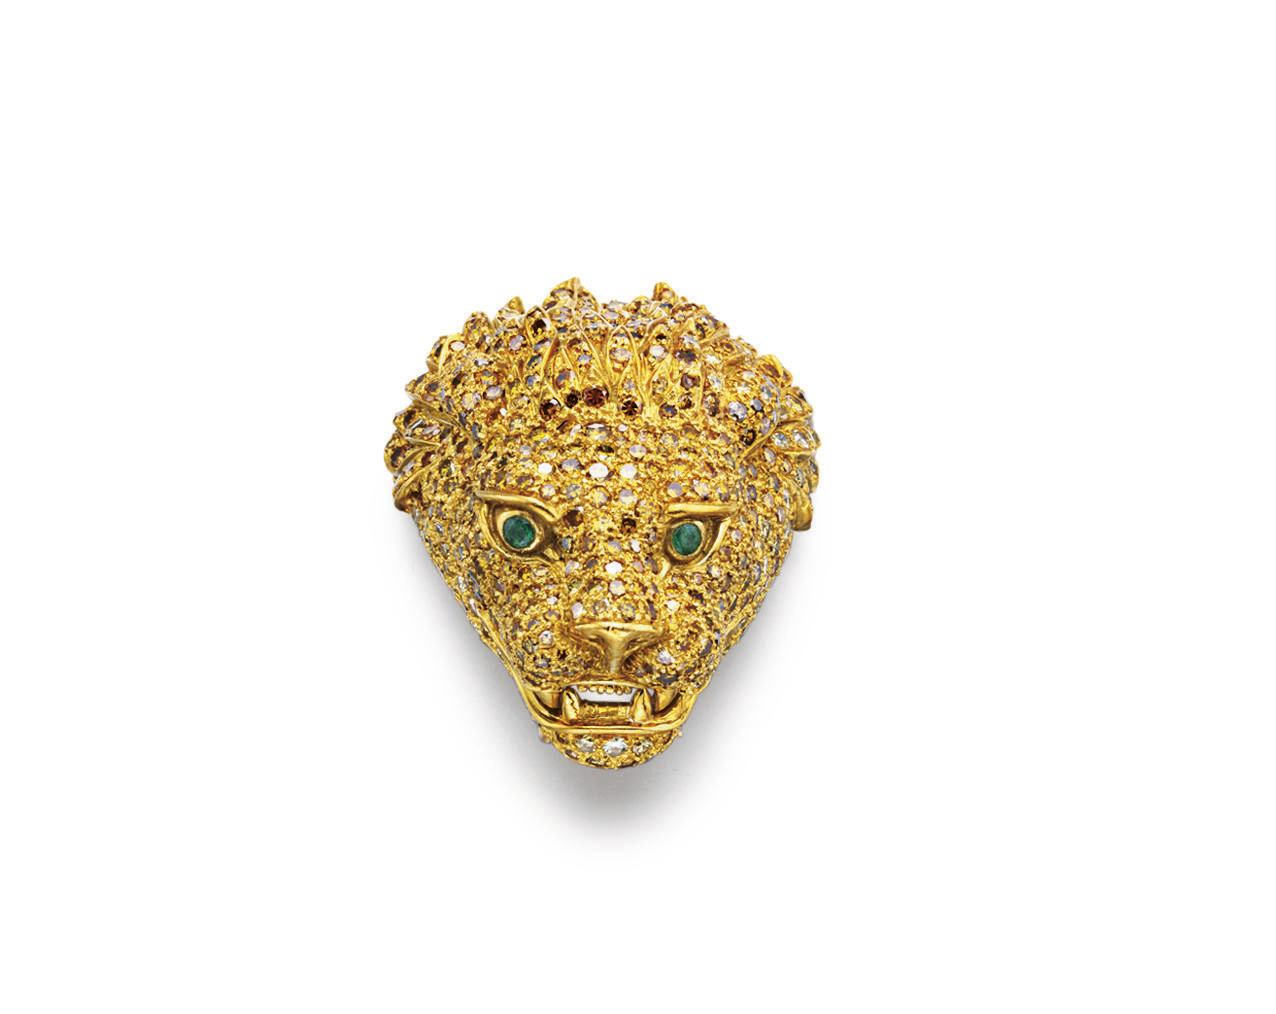 A COLORED DIAMOND AND EMERALD